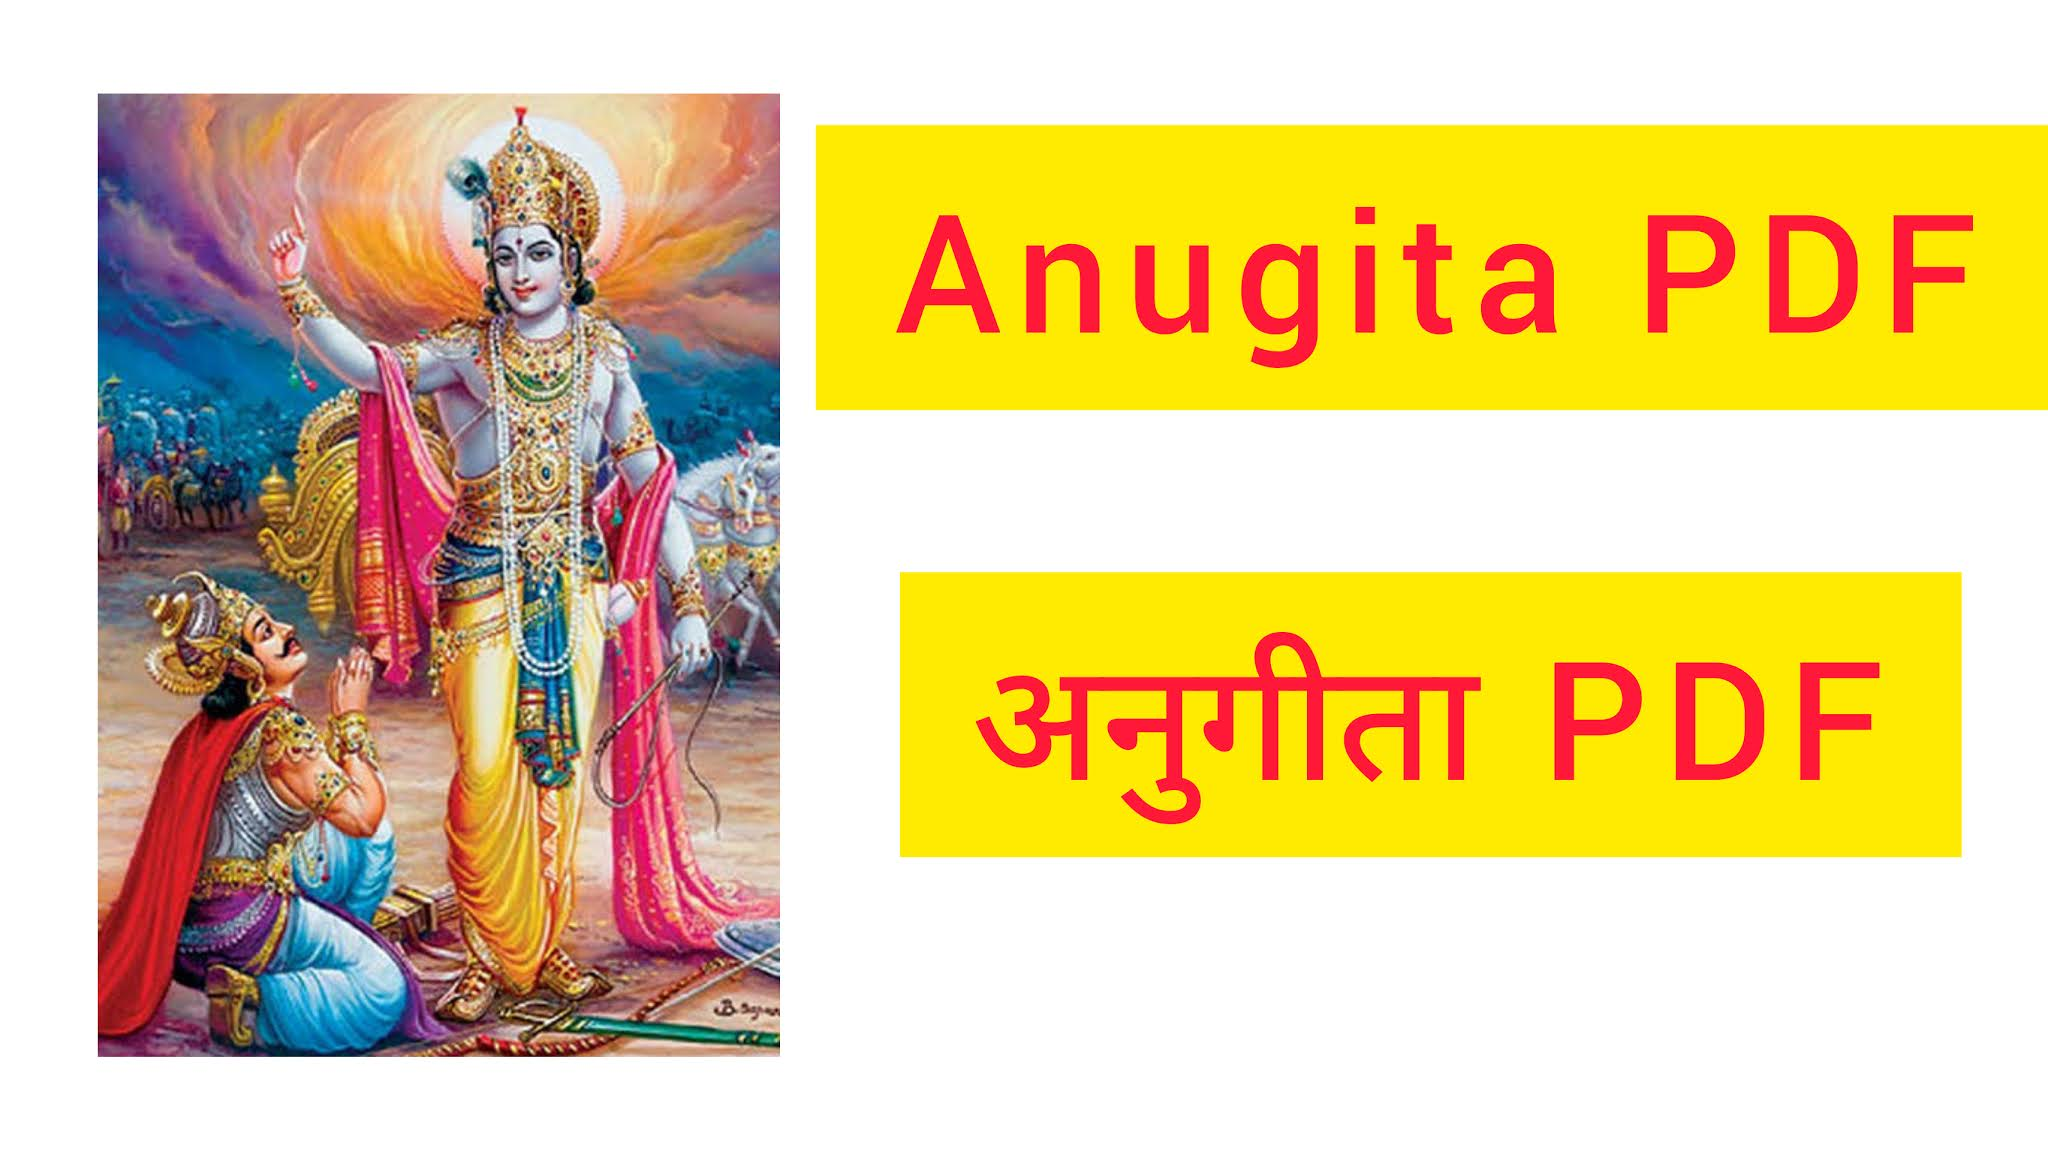 Anugita PDF in Sanskrit